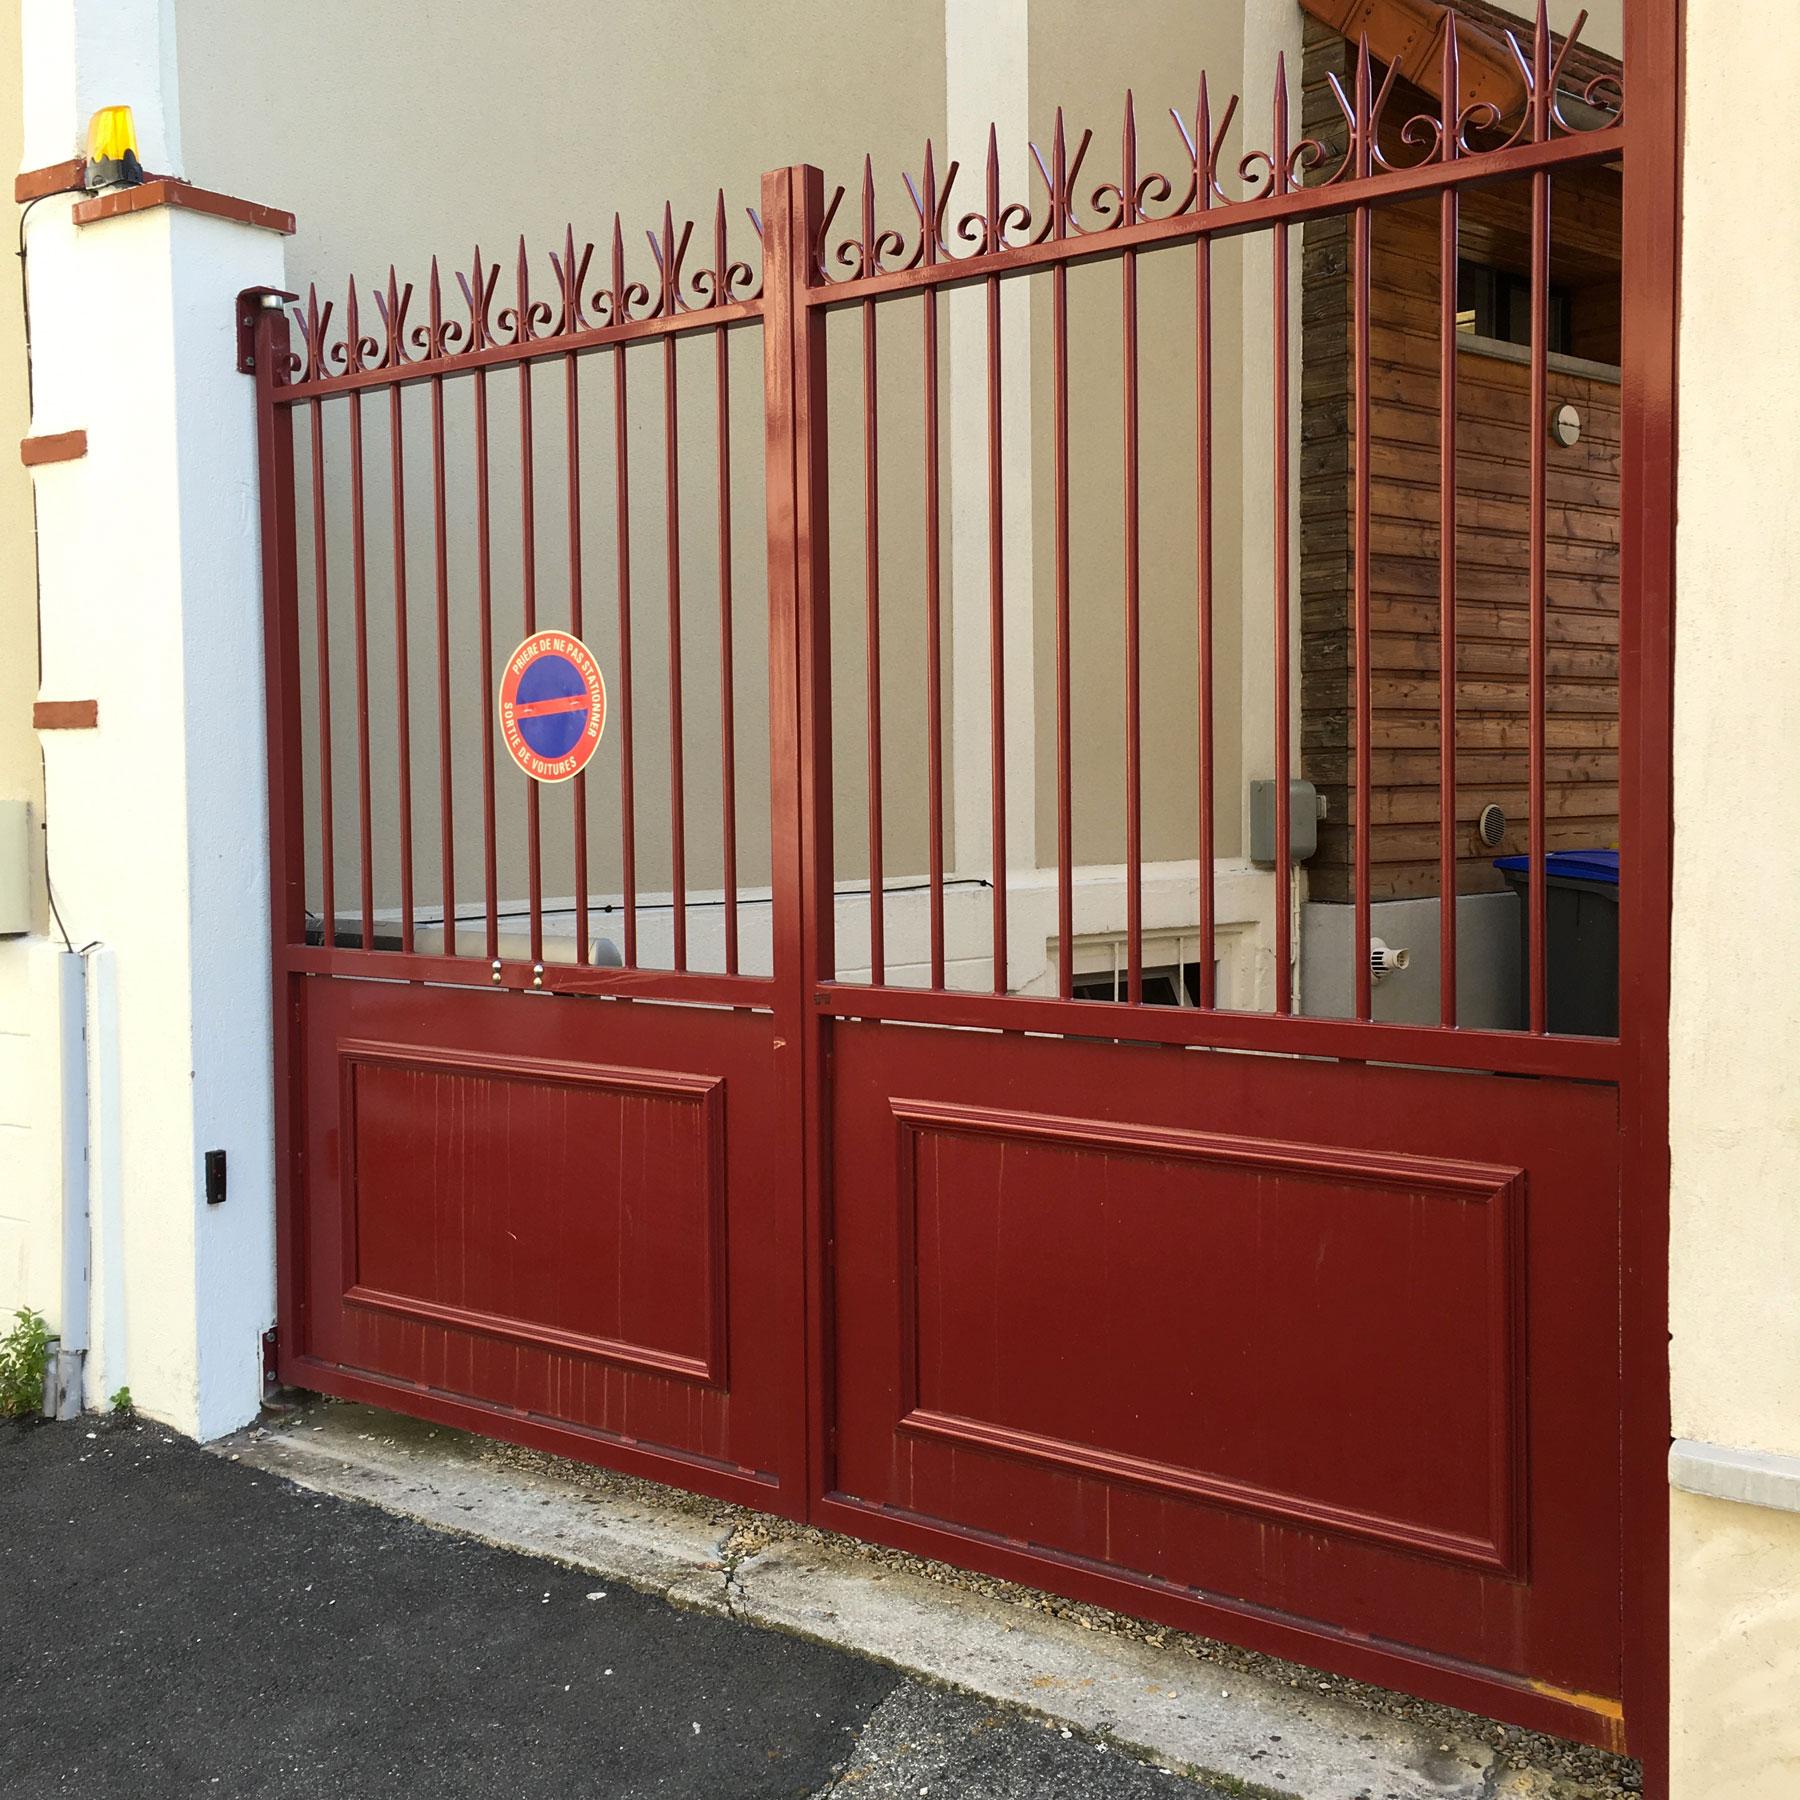 56-portail-acier-motorise-laque-epoxy-Bak-Systemes